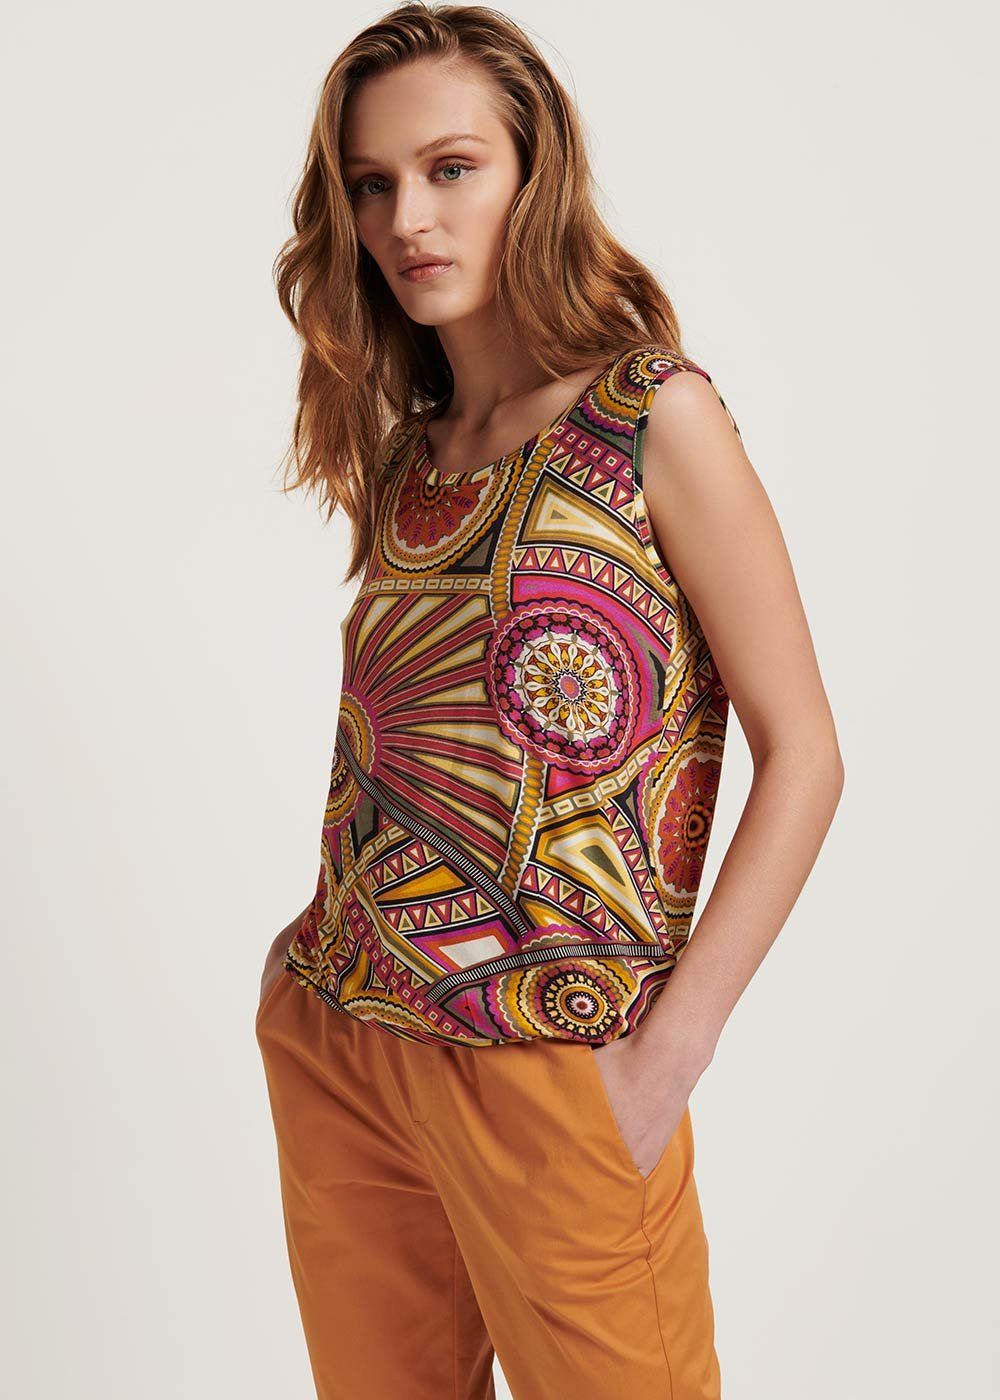 Maria sleeveless patterned top - Aragosta / Timo Fantasia - Woman